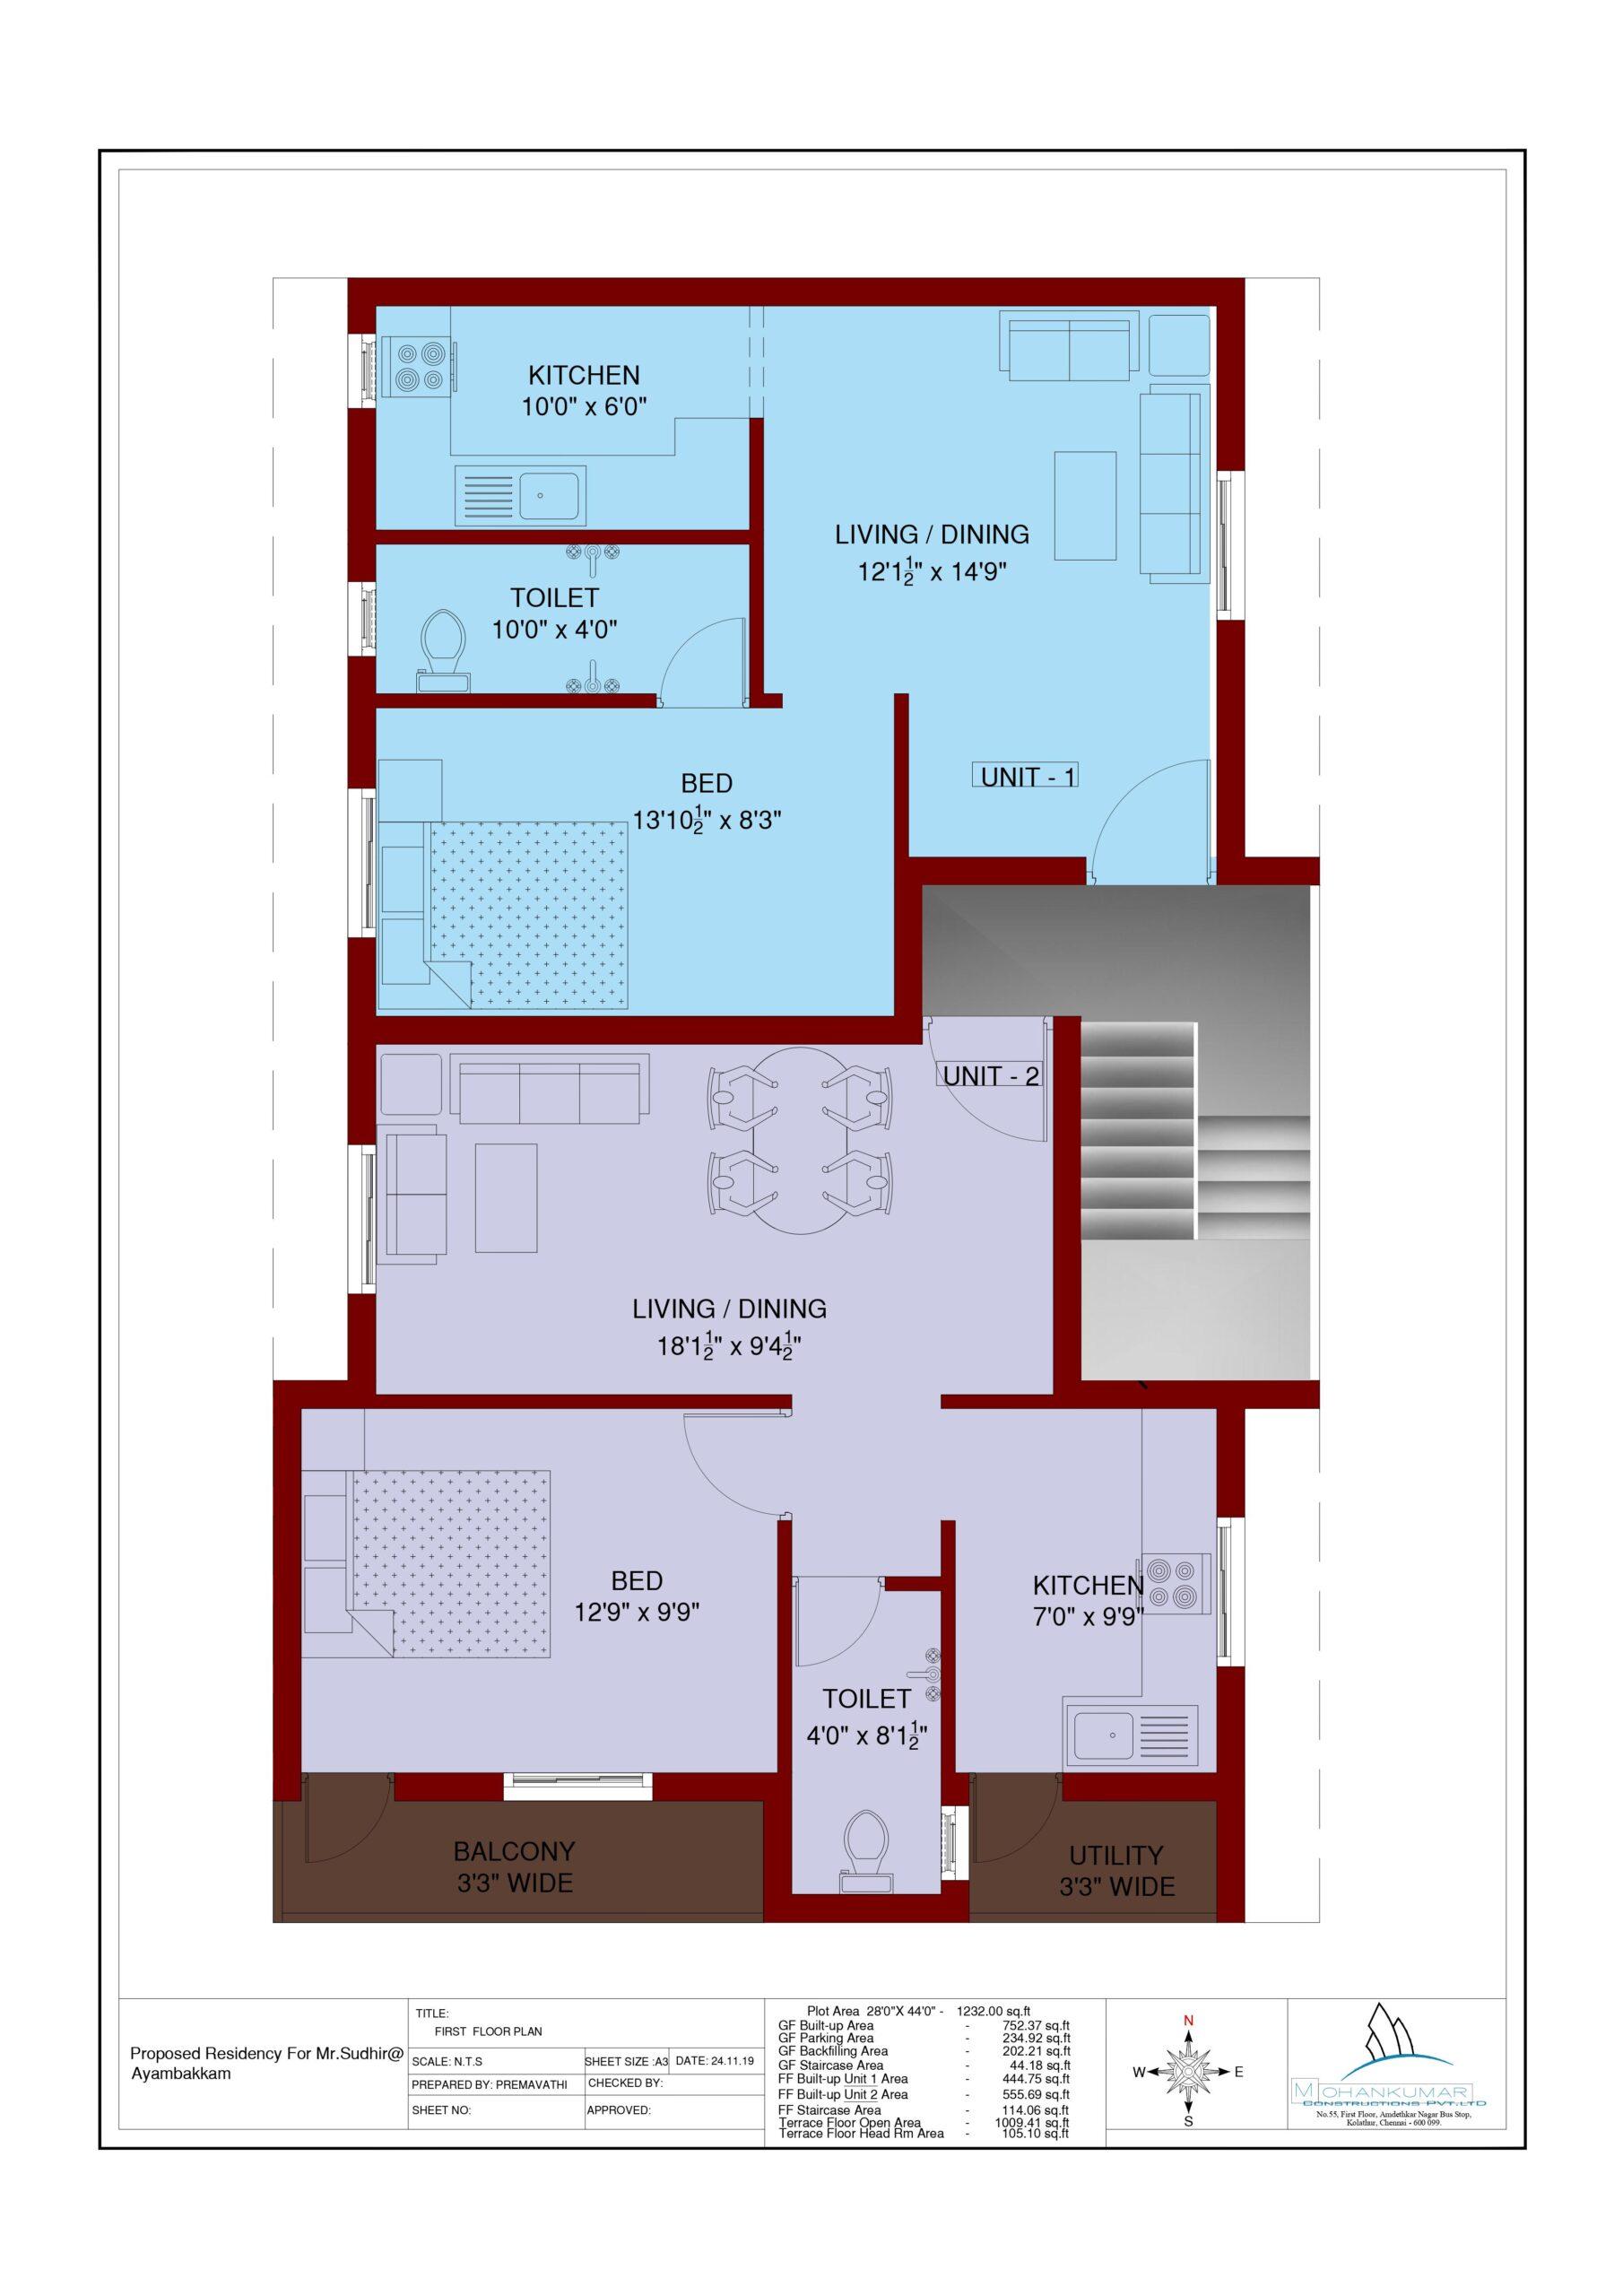 1300 sqft house plan